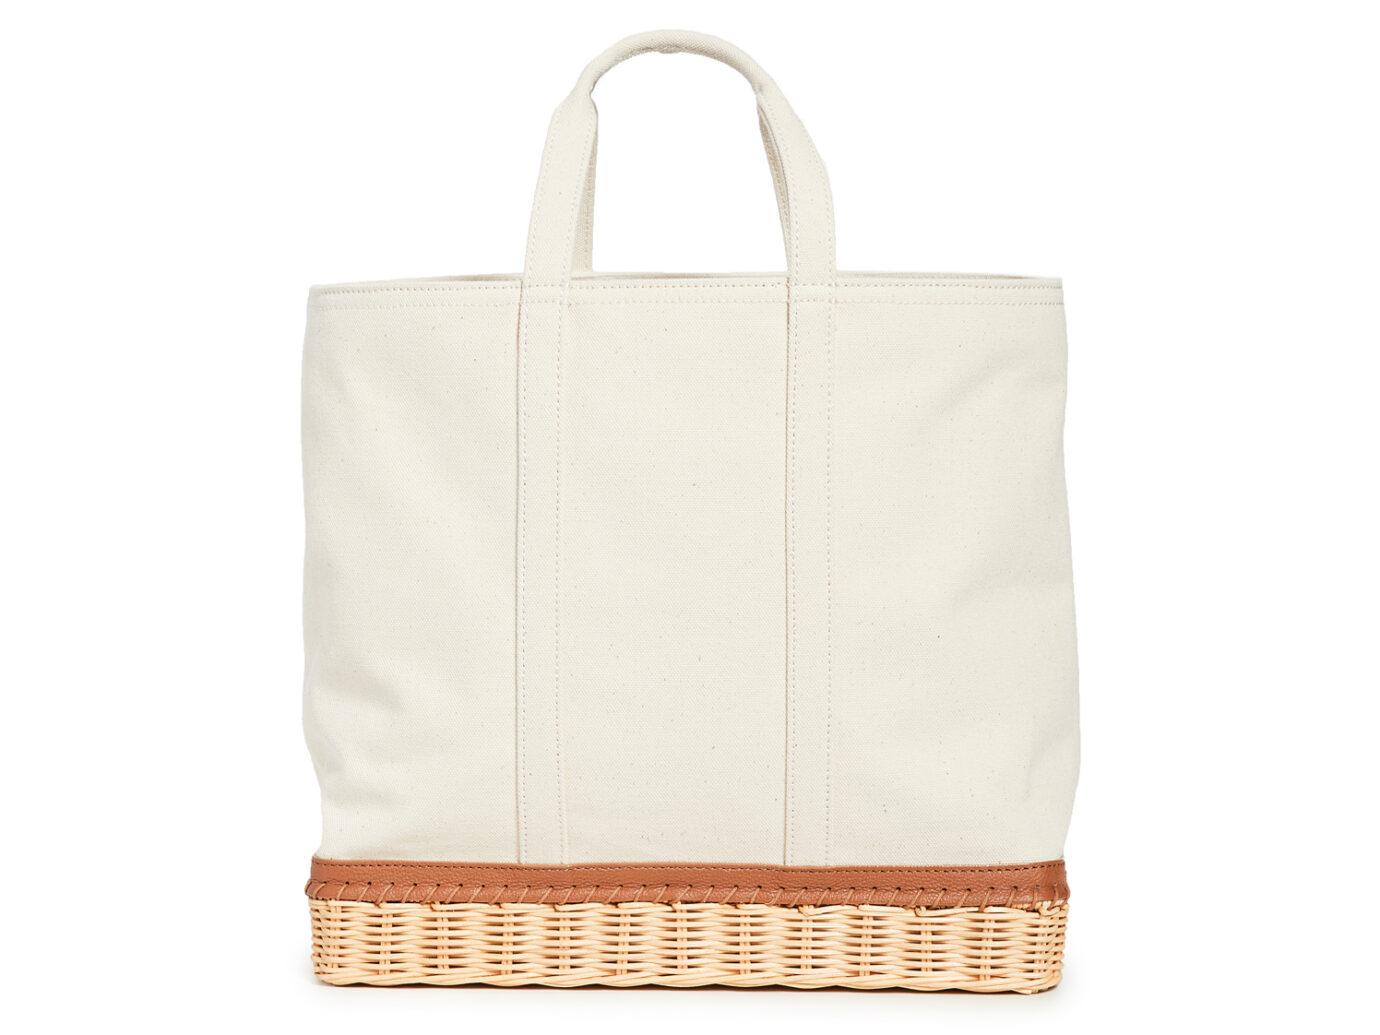 Luxury hand bagbrand tote bag2021 Bagbrand inspired bagluxury travel bagclassy bag designer inspired leather bagbrand black bag